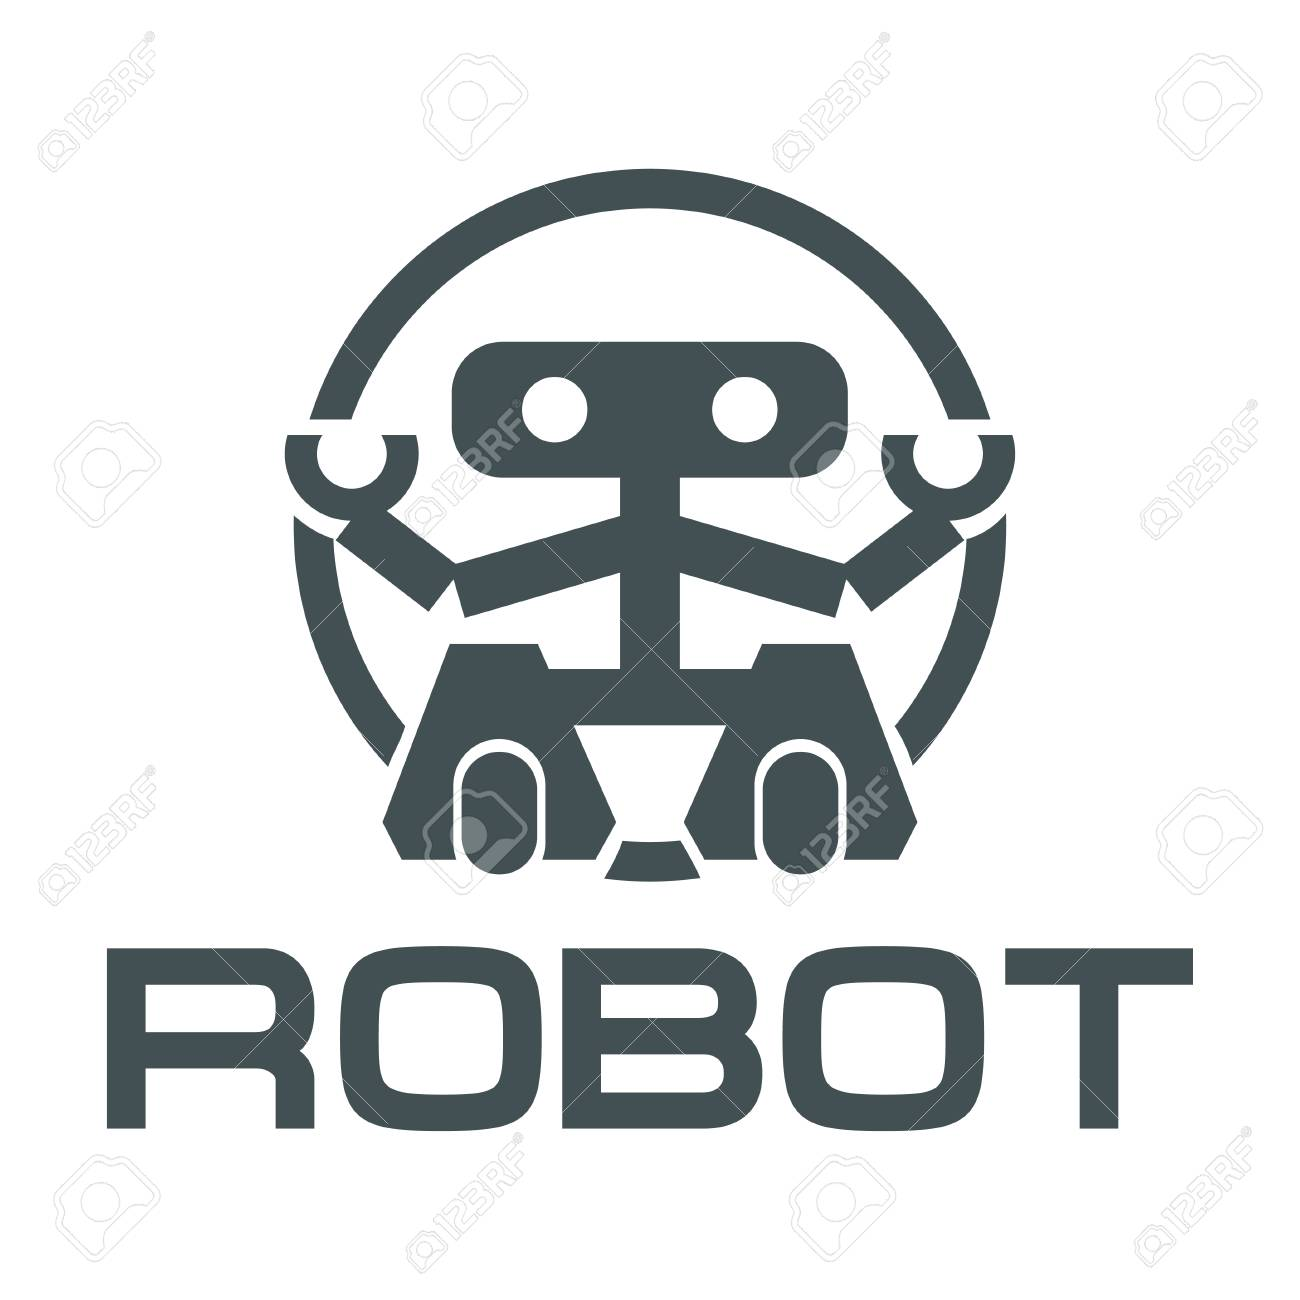 Robot Logo For Design Robotics Vector Graphics To Design Royalty